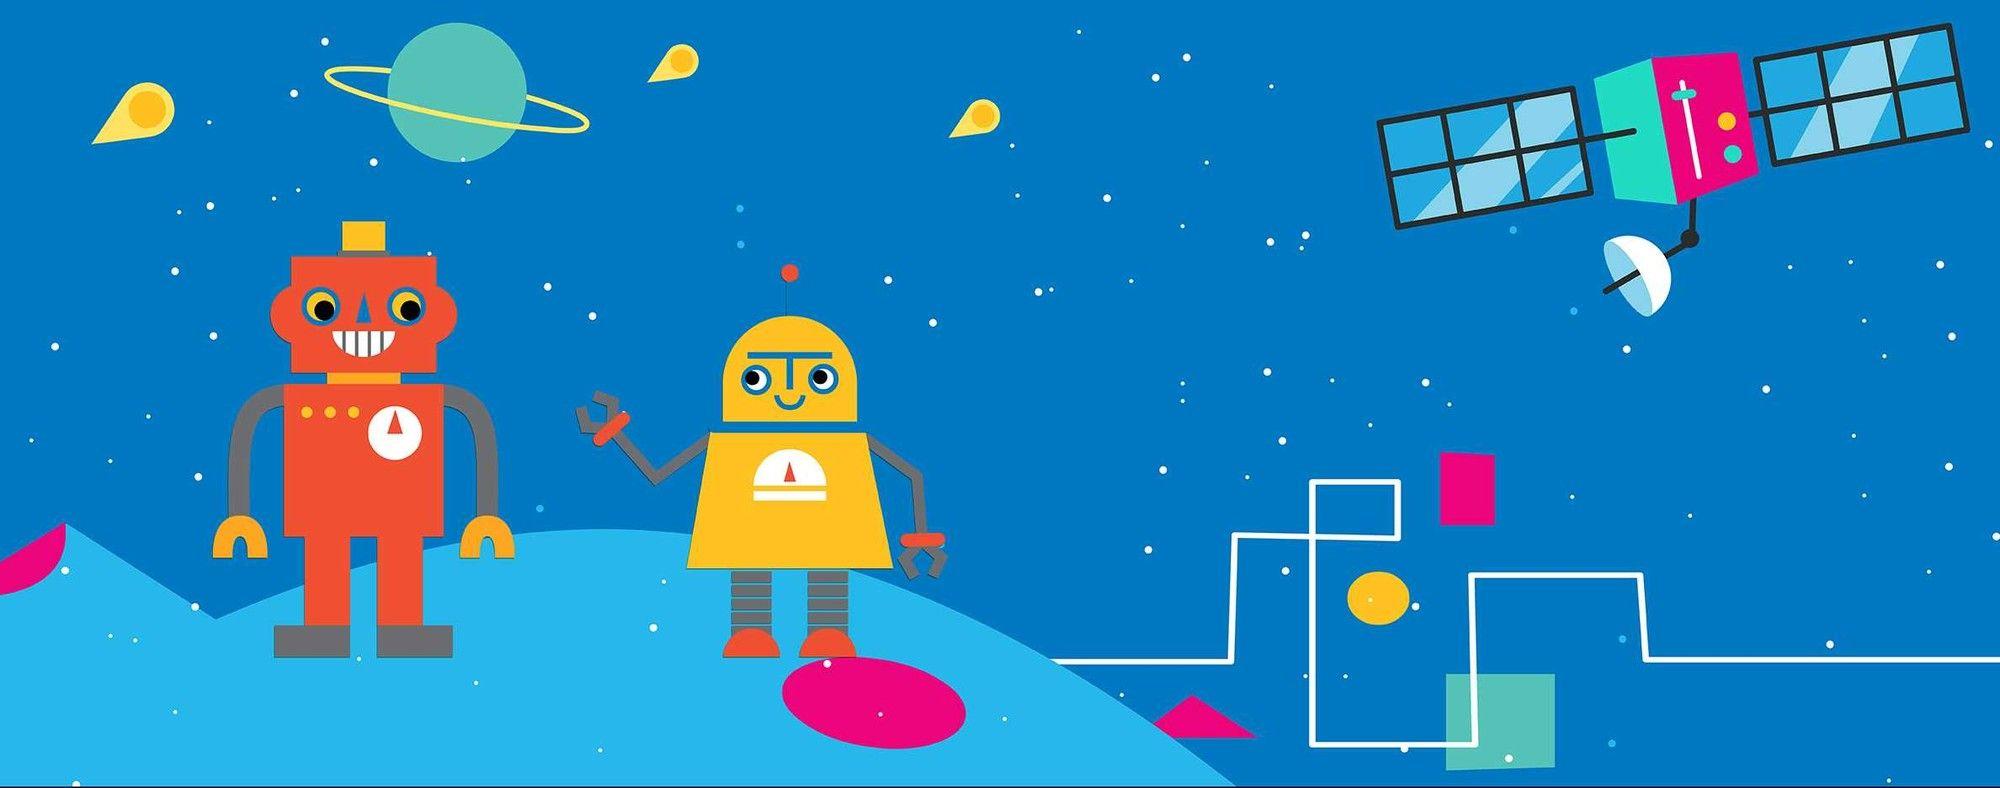 Robots in Space HeadLightz Headboard Image